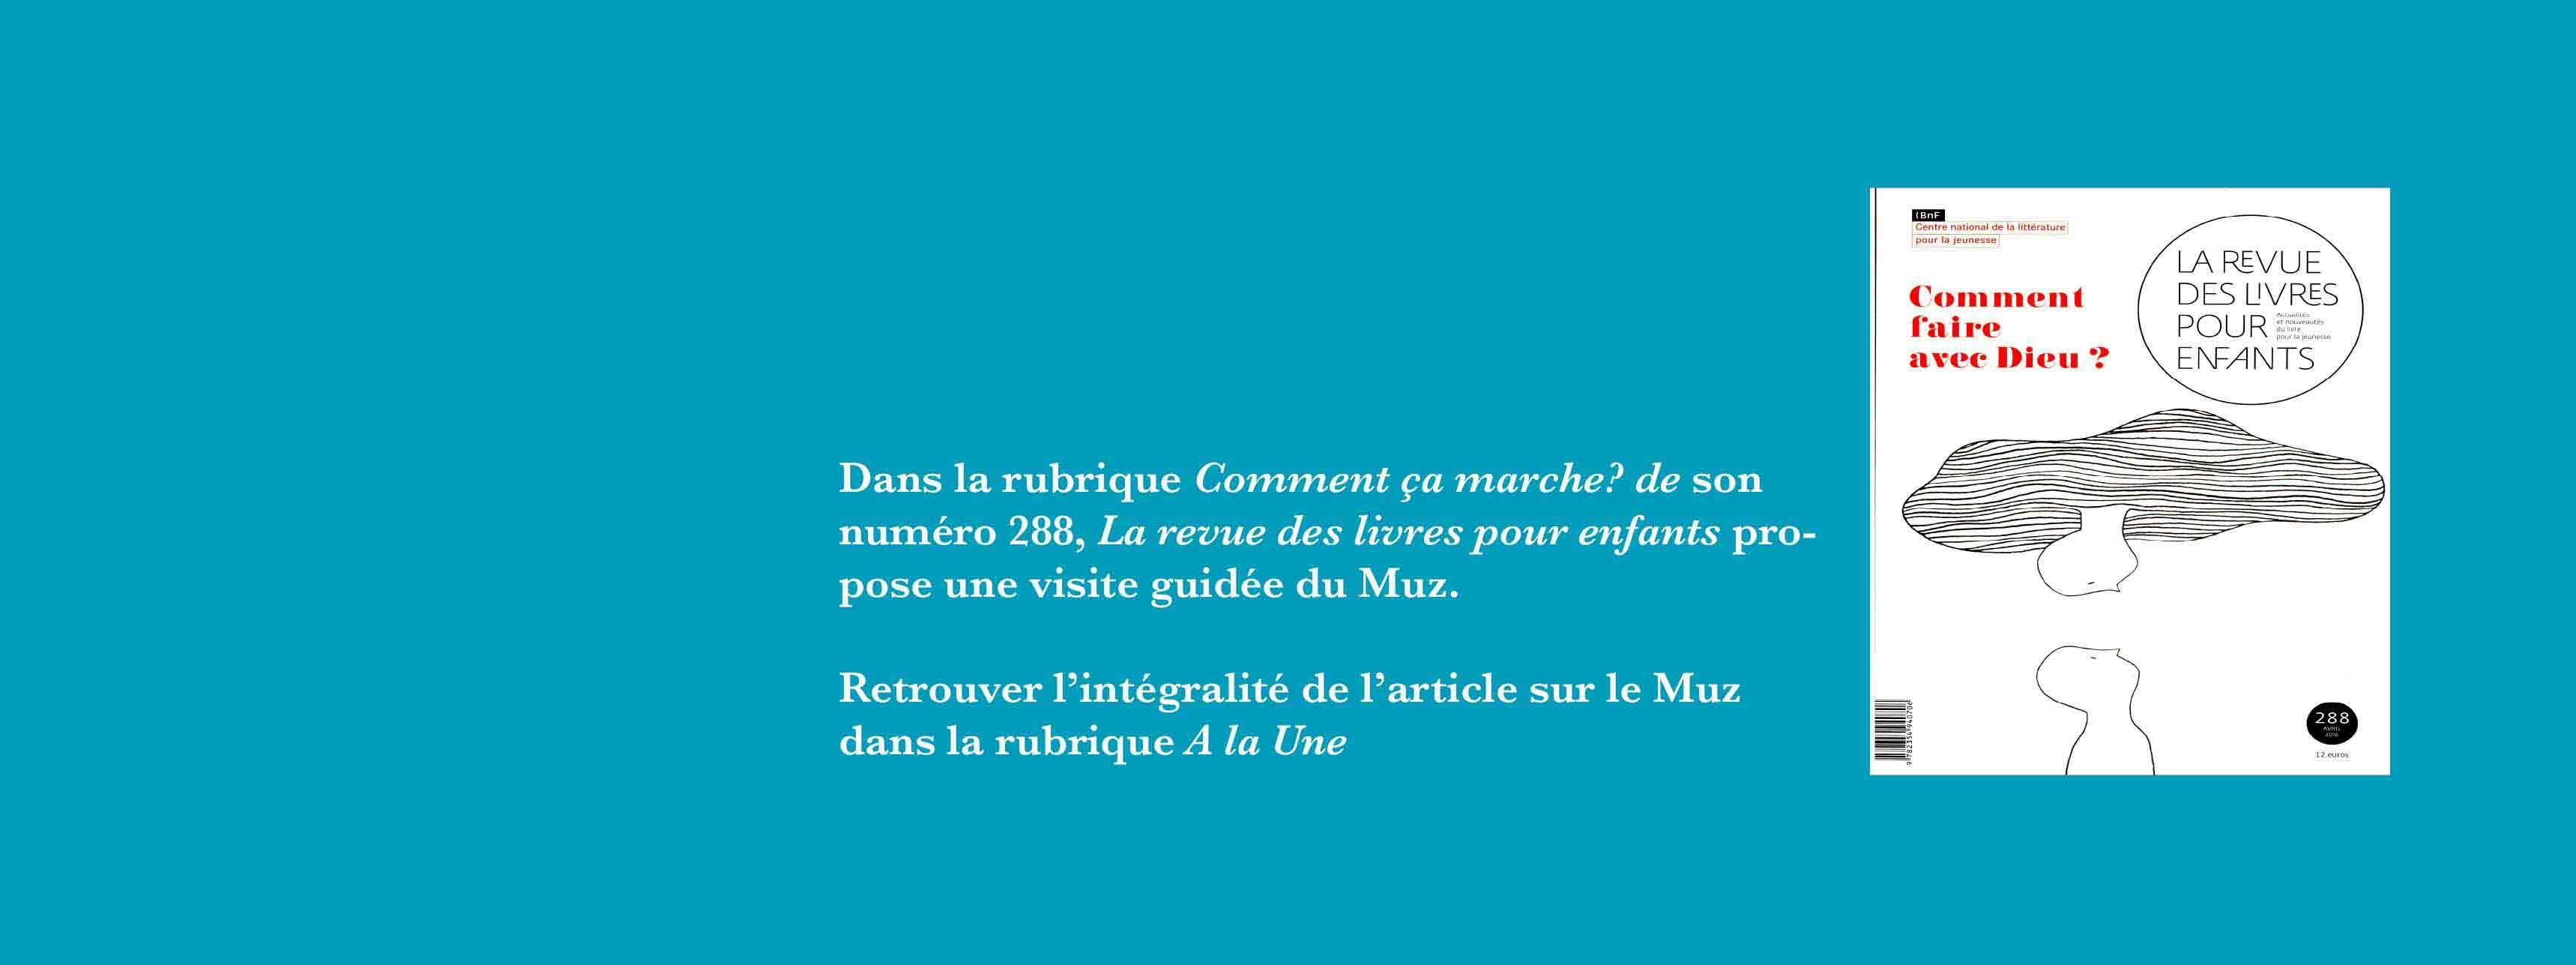 accueil-BNF-2-